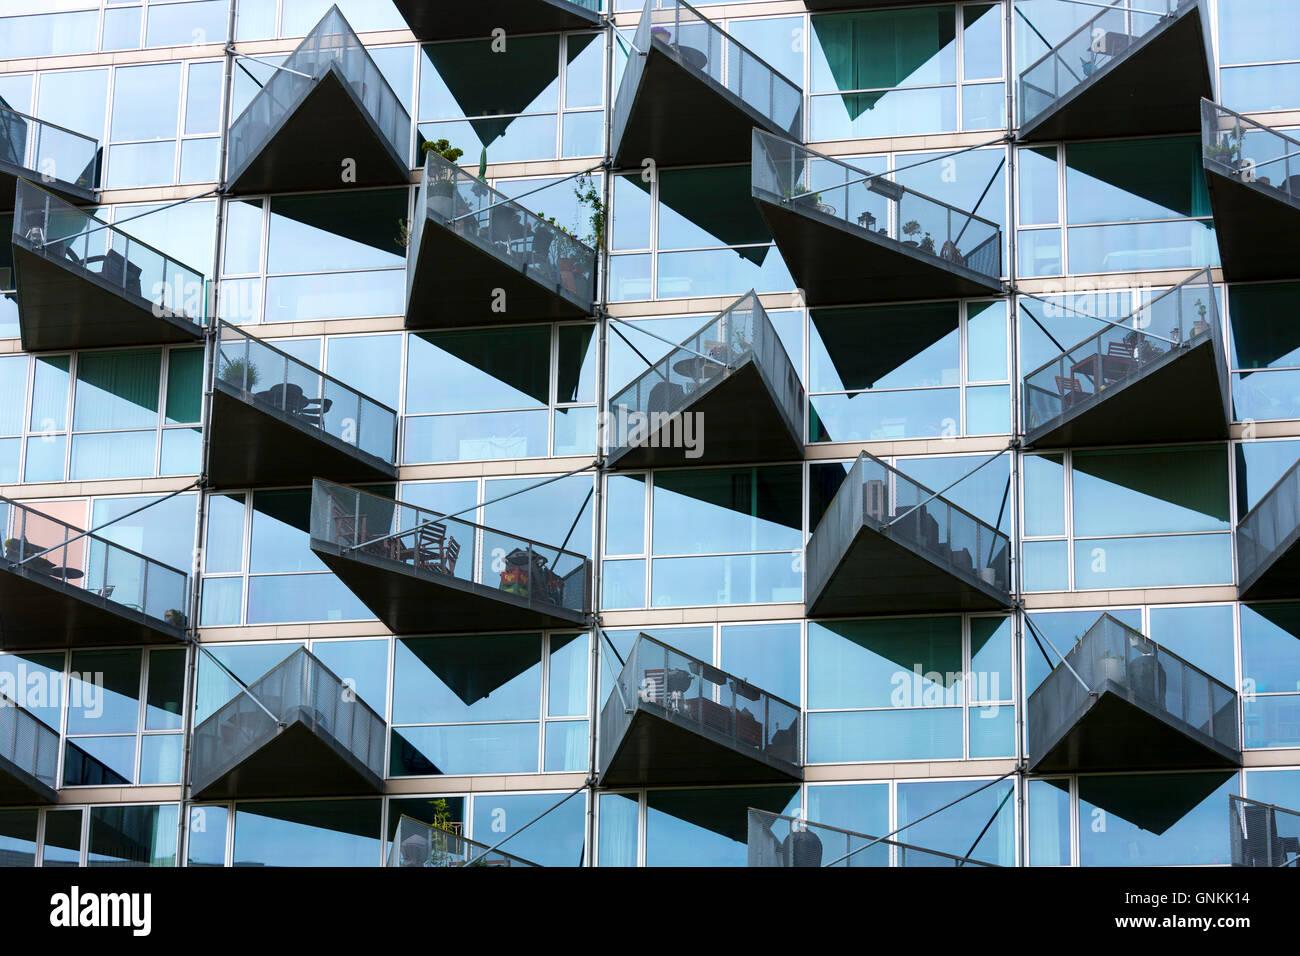 Glass balcony modern architecture new high rise homes development Orestads Boulevard in Orestad City area, Copenhagen, Stock Photo